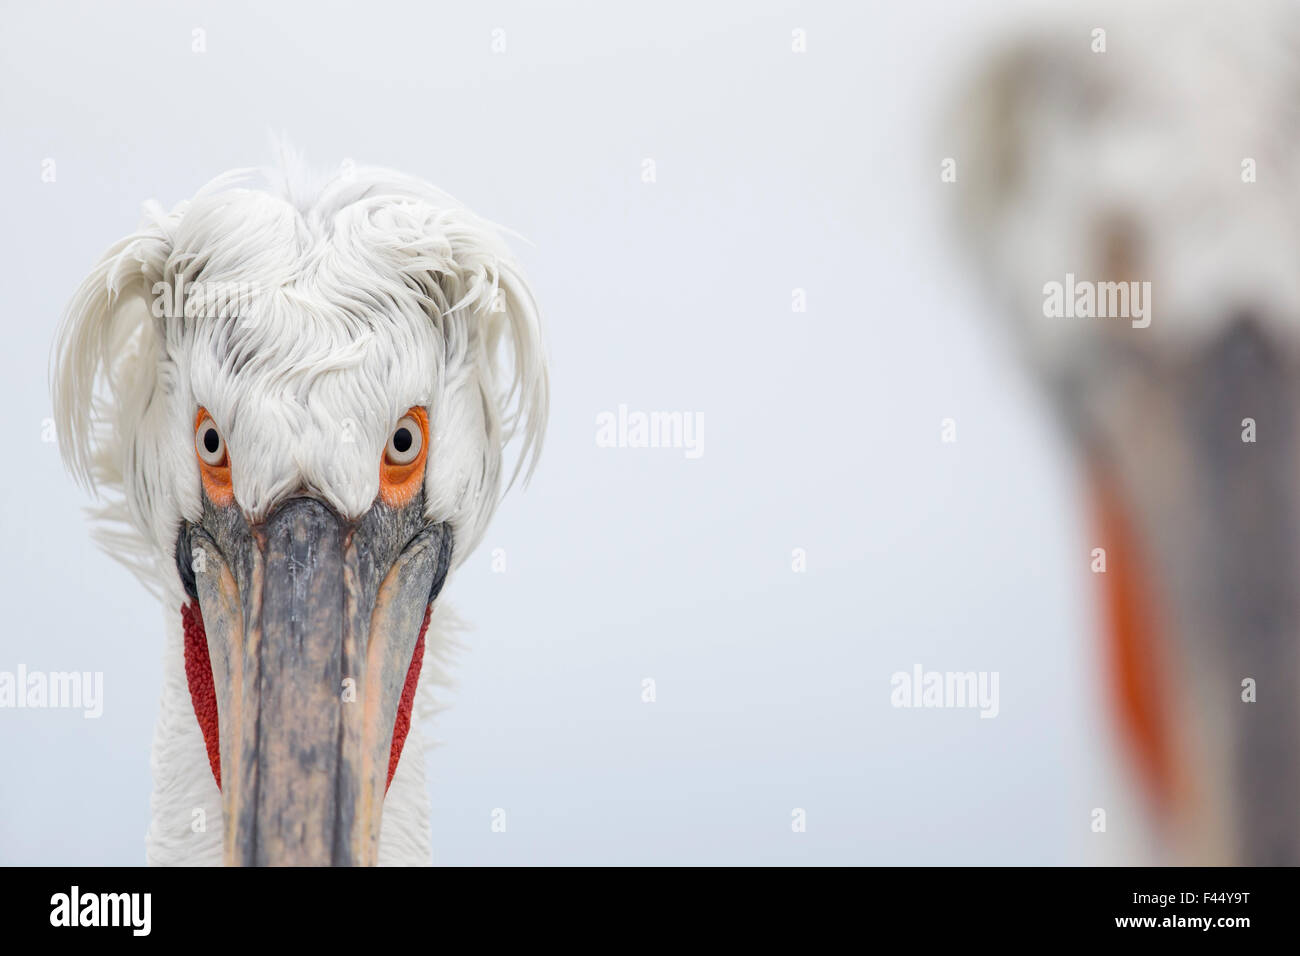 Dalmatian Pelican (Pelecanus crispus) portrait, Lake Kerkini, Greece. February. Highly honoured in the Birds Category - Stock Image